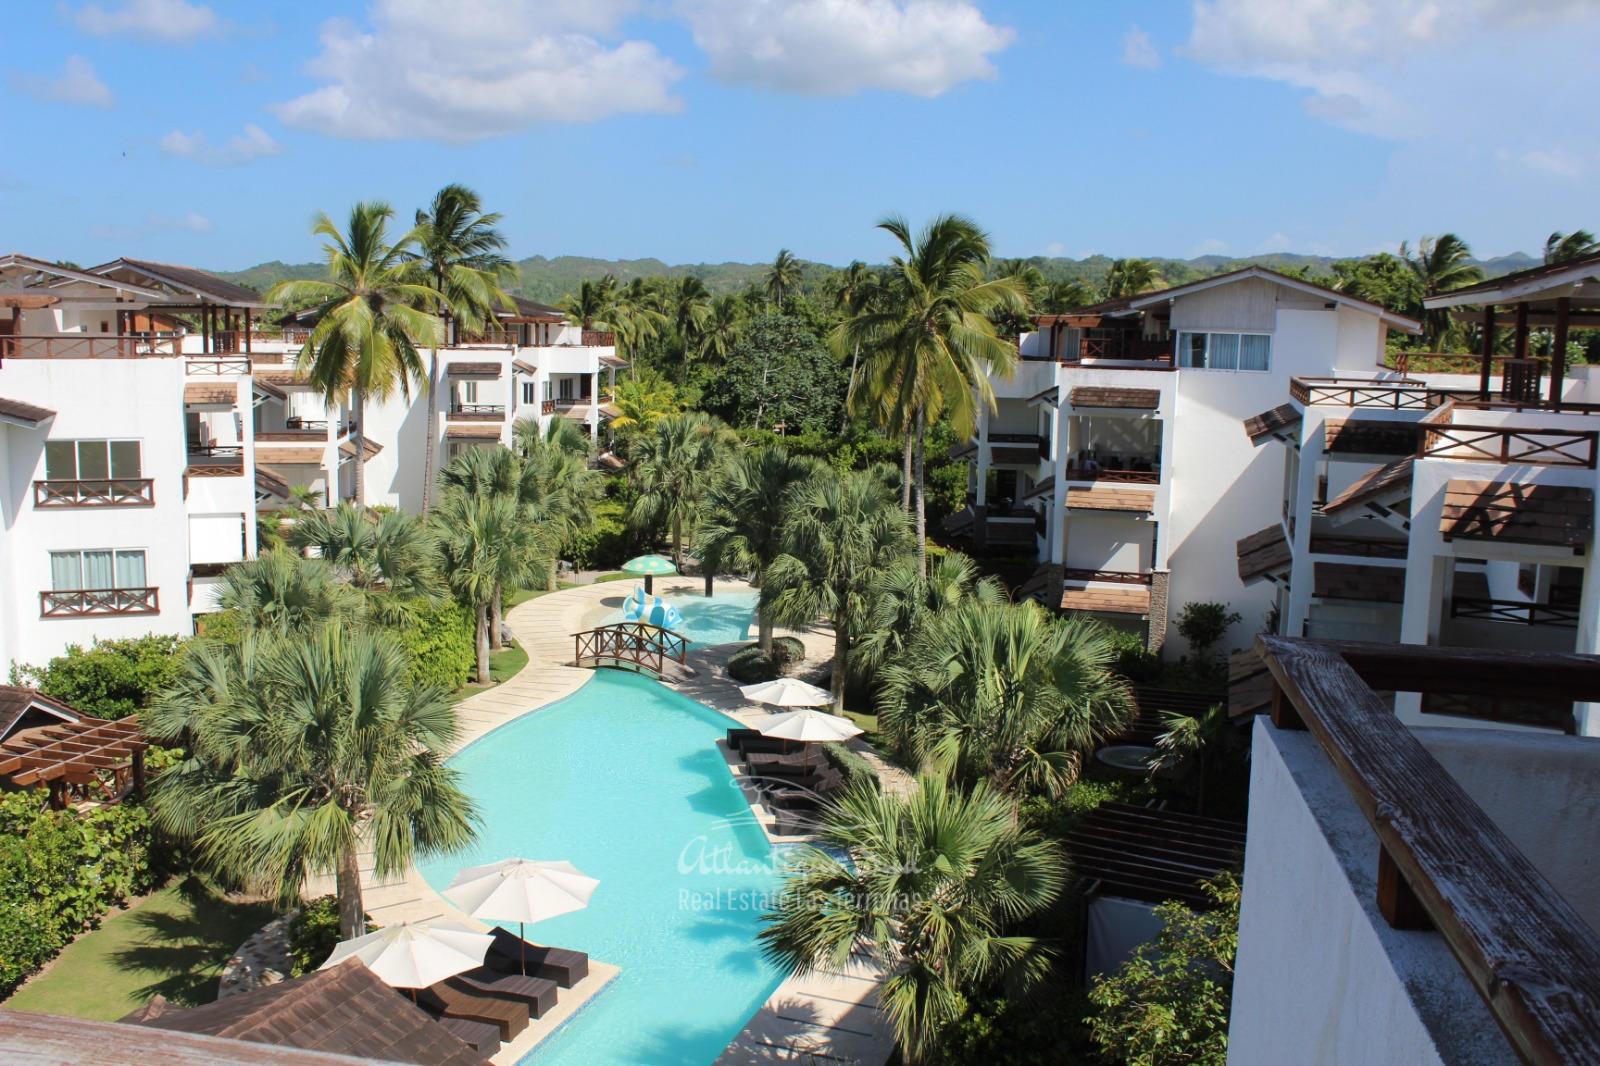 Apartments near the beach real estate las terrenas dominican republic 31 (11).jpg